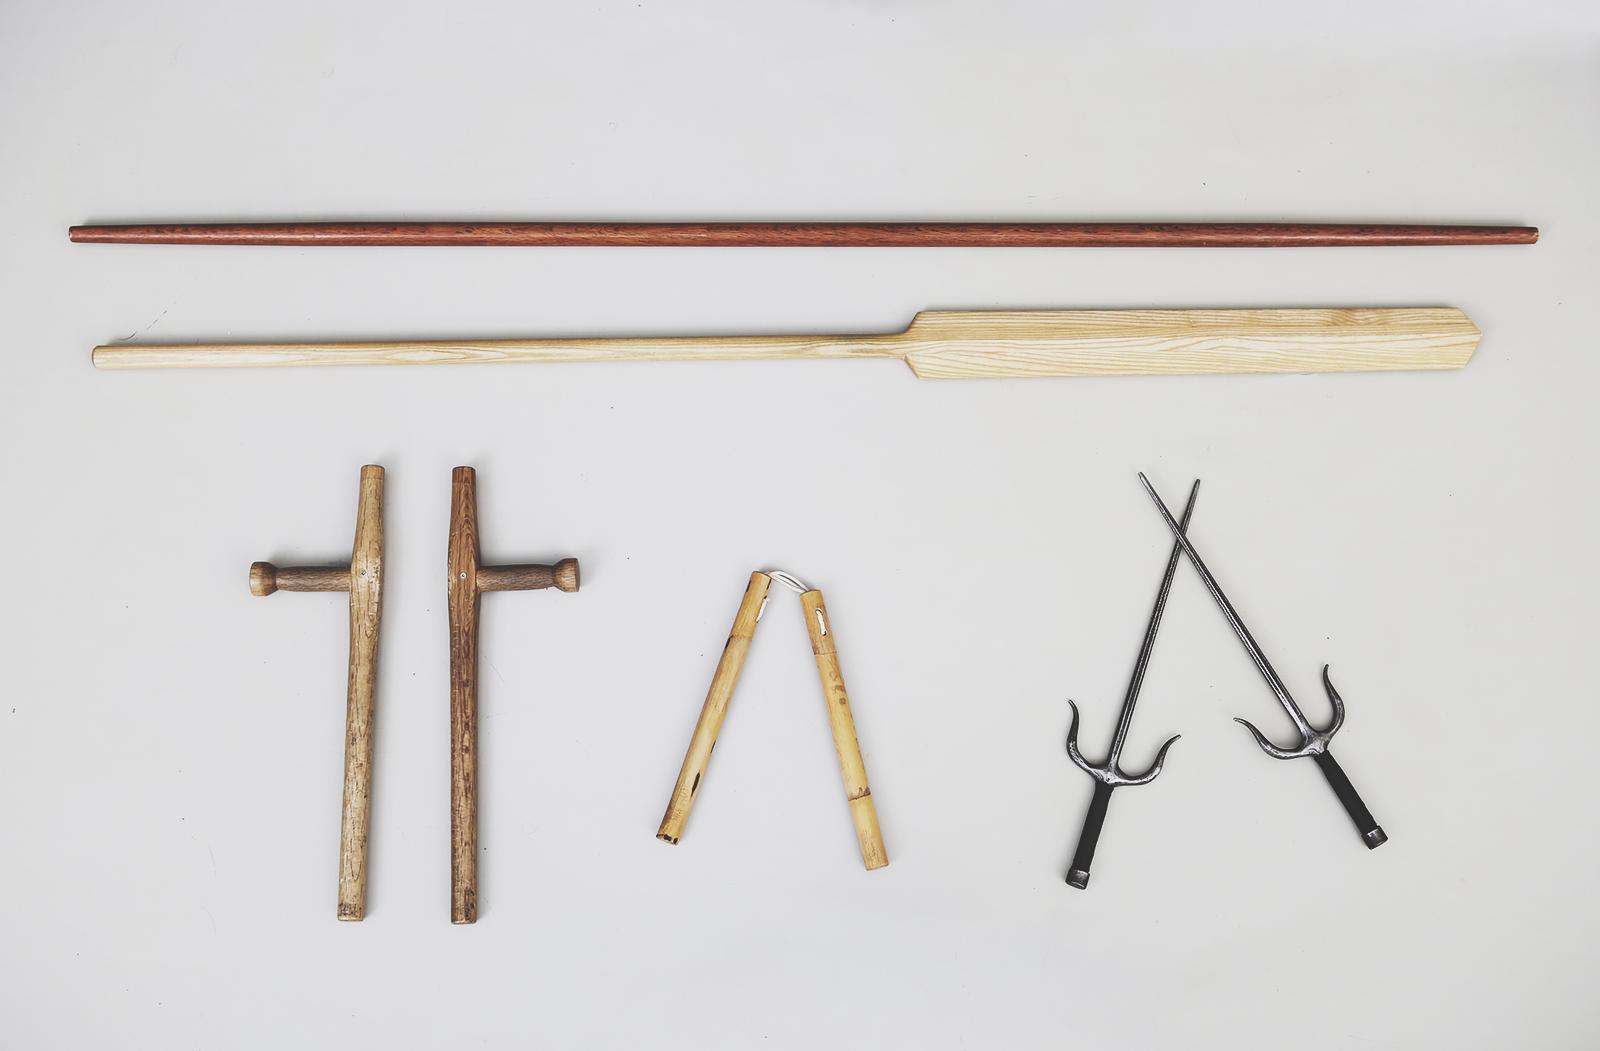 Atelier Kobudo : maniement des armes traditionnelles d'Okinawa